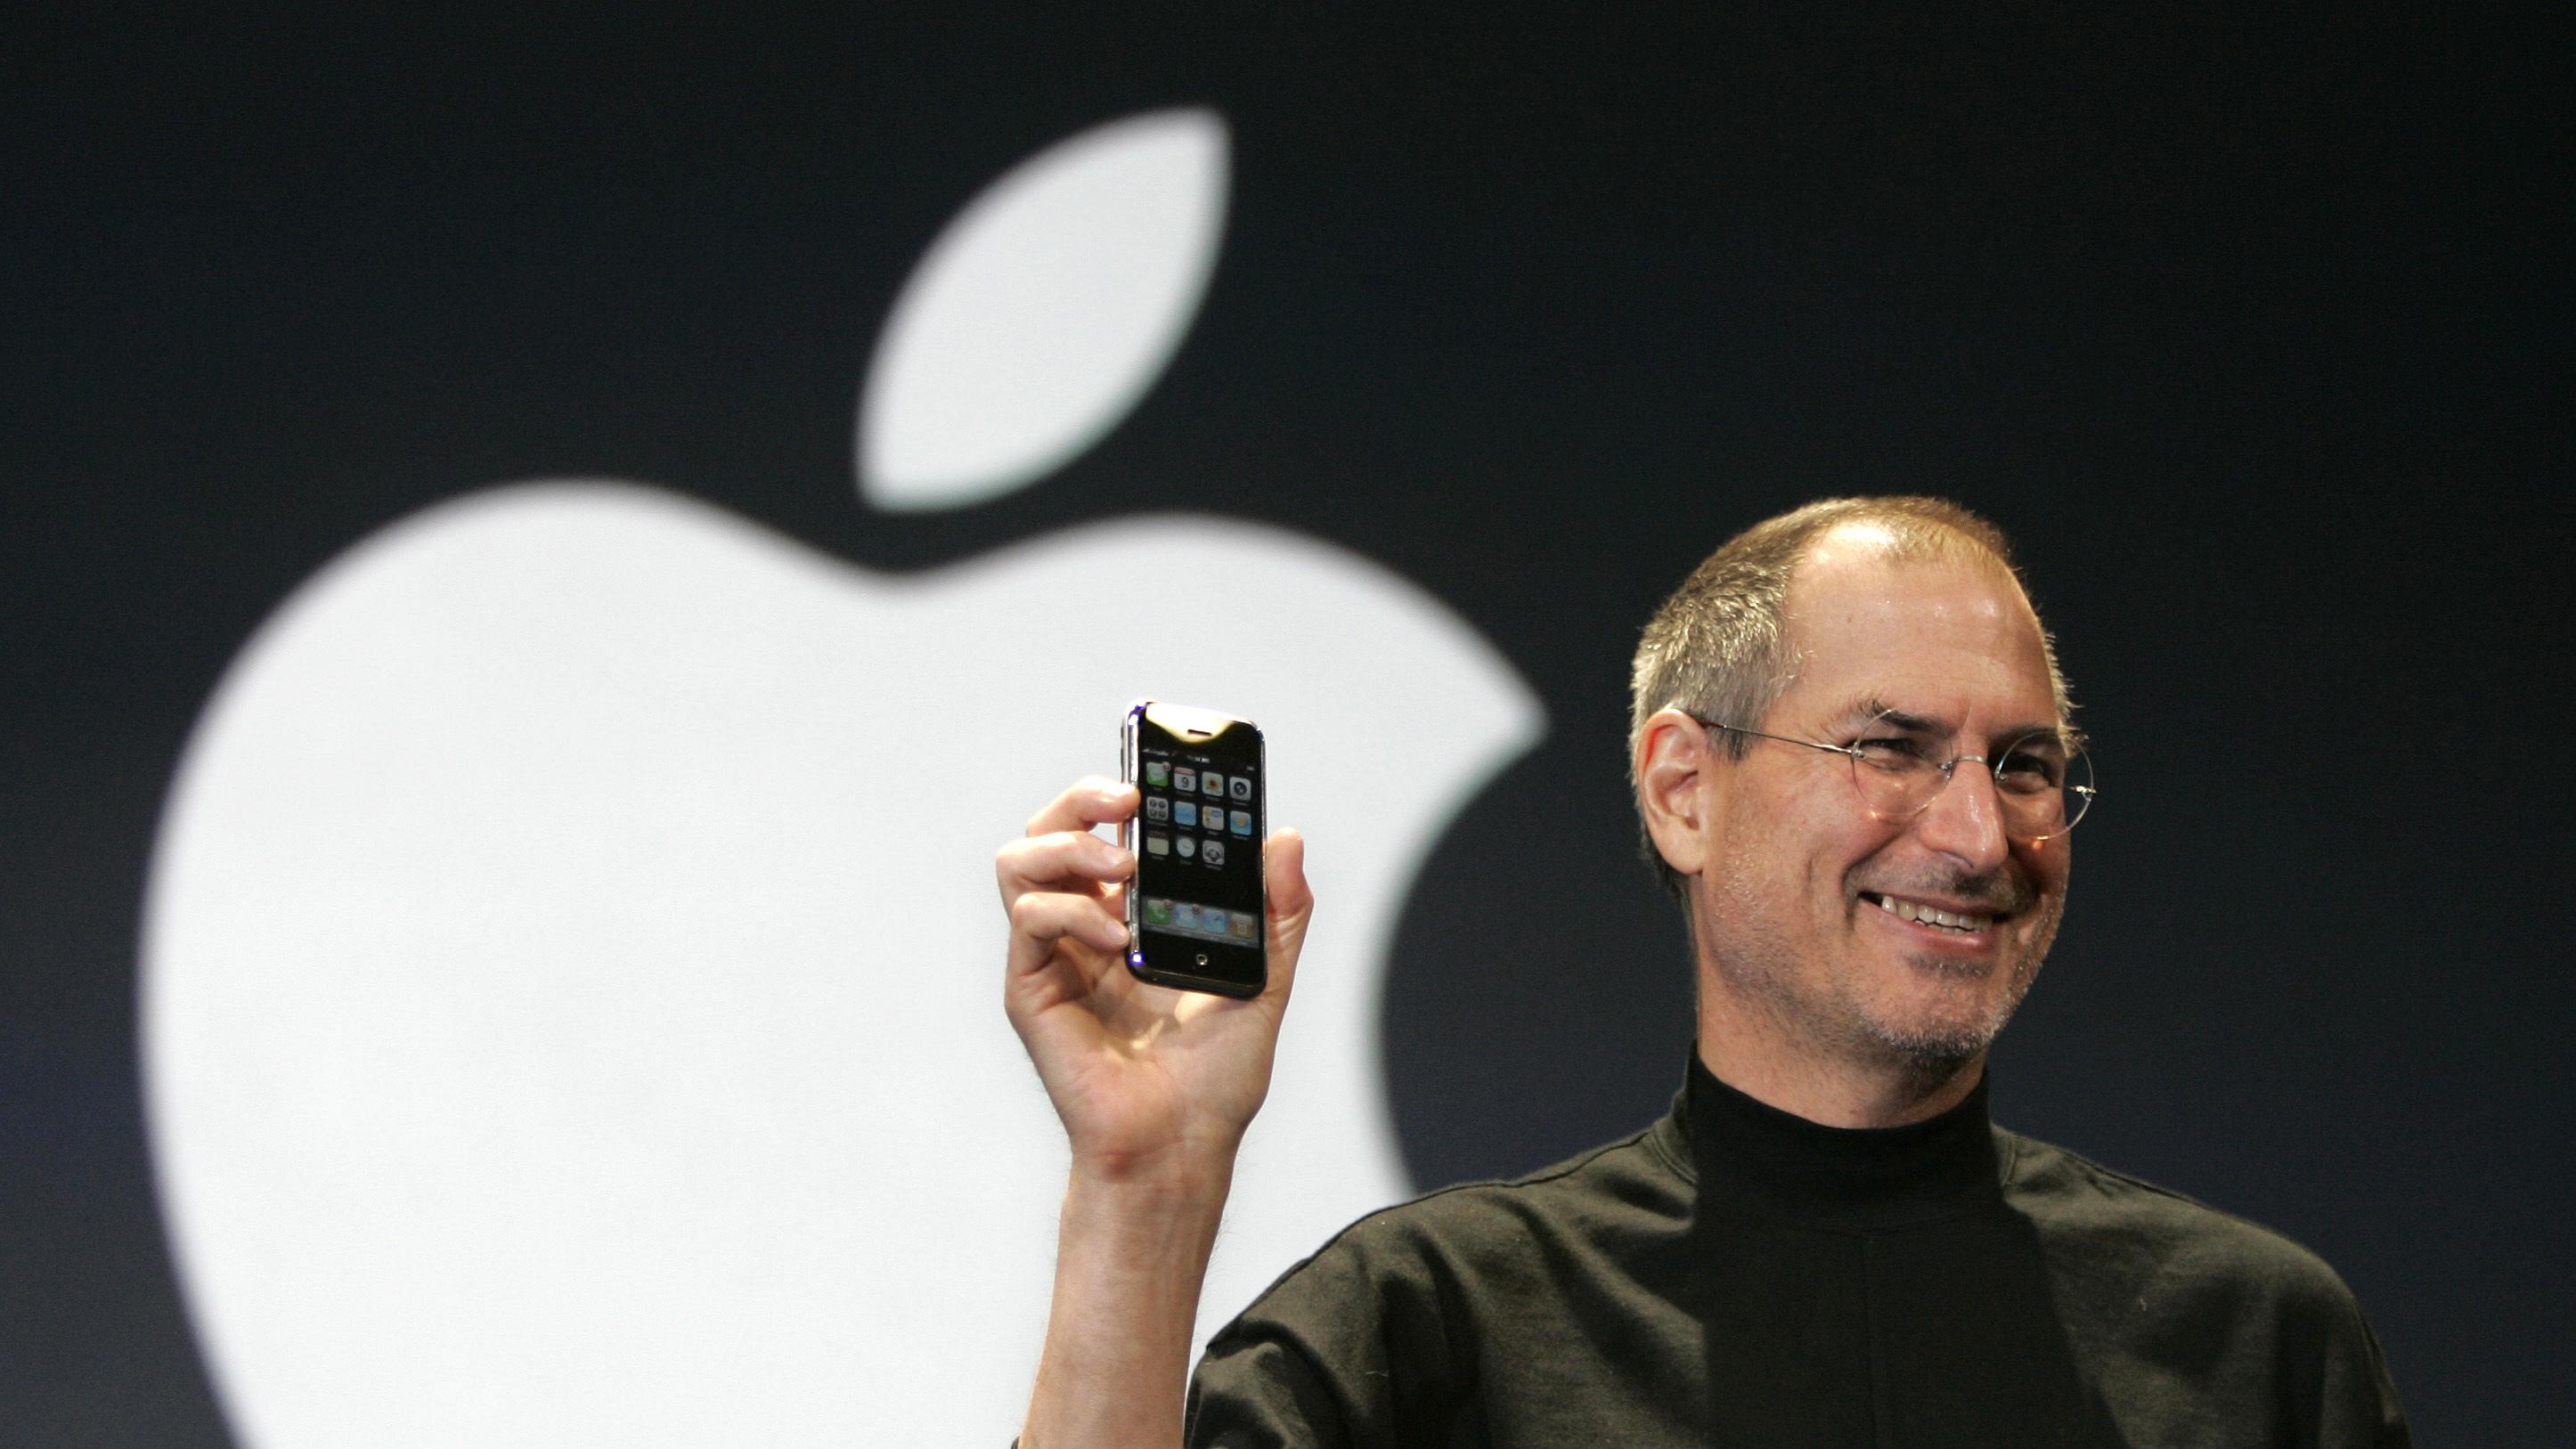 Apple engineer Ken Kocienda on what it was like to design the